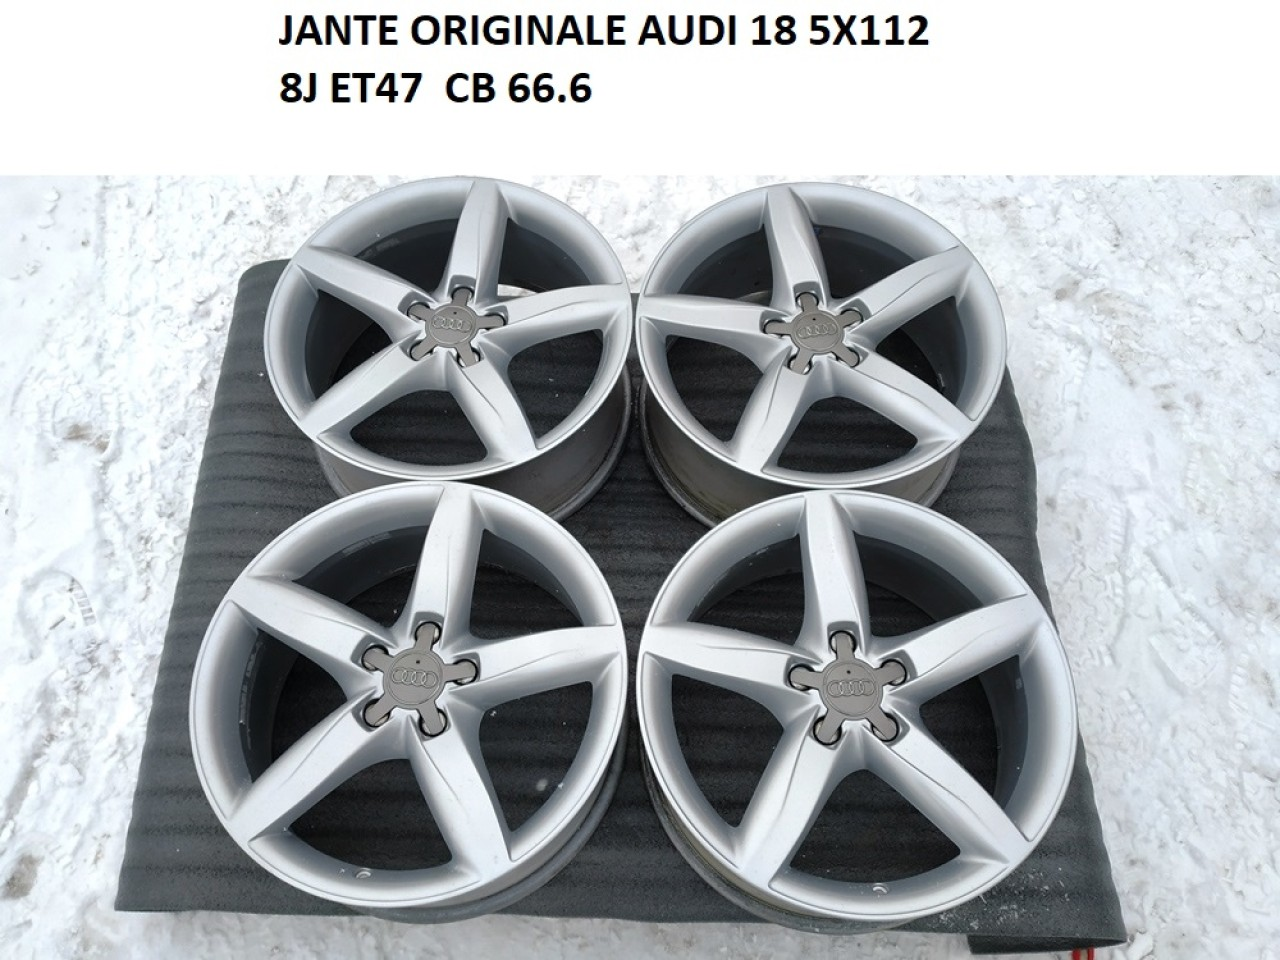 JANTE AUDI 18 5X112 66.6